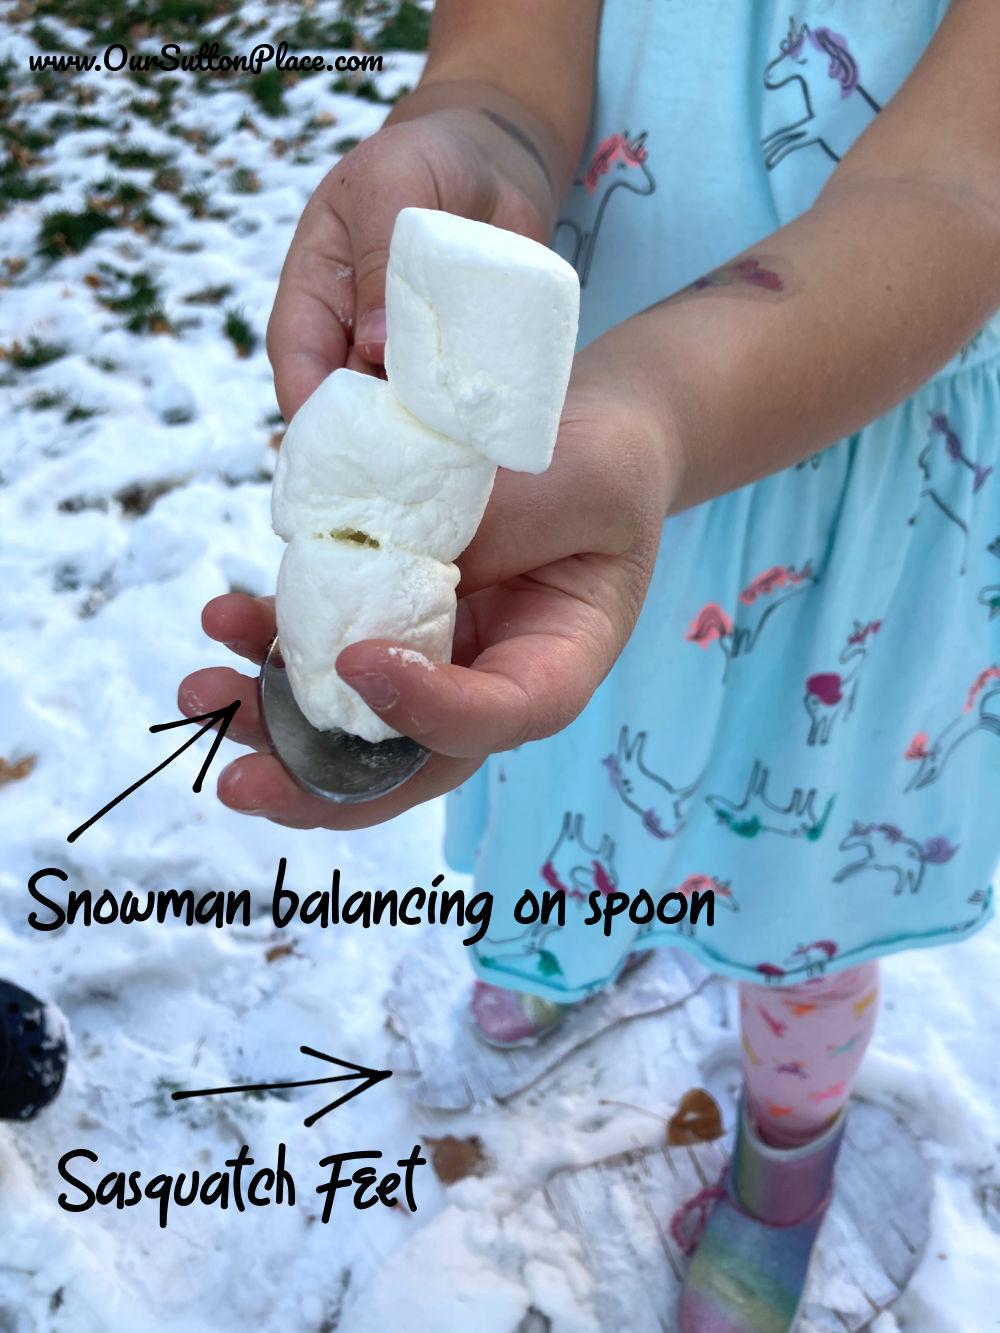 closup of supplies (snowman marshmallow and white cardboard Sasquatch feet